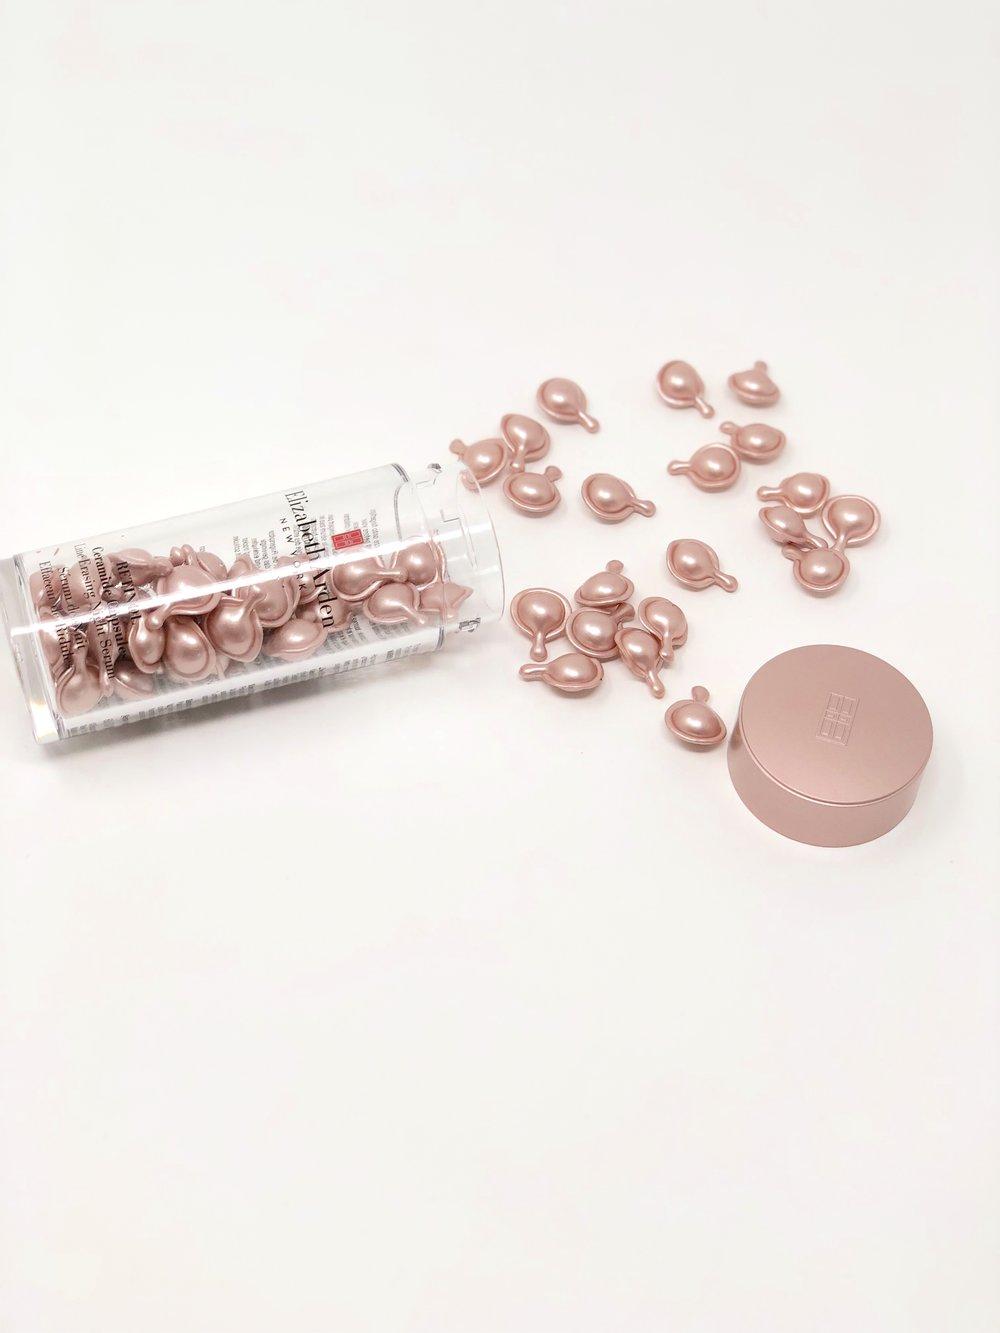 Rolling out onto store shelves now, Elizabeth Arden Retinol Ceramide Capsules Line Erasing Serum, $106 CN ($84 US)/ 60 capsules